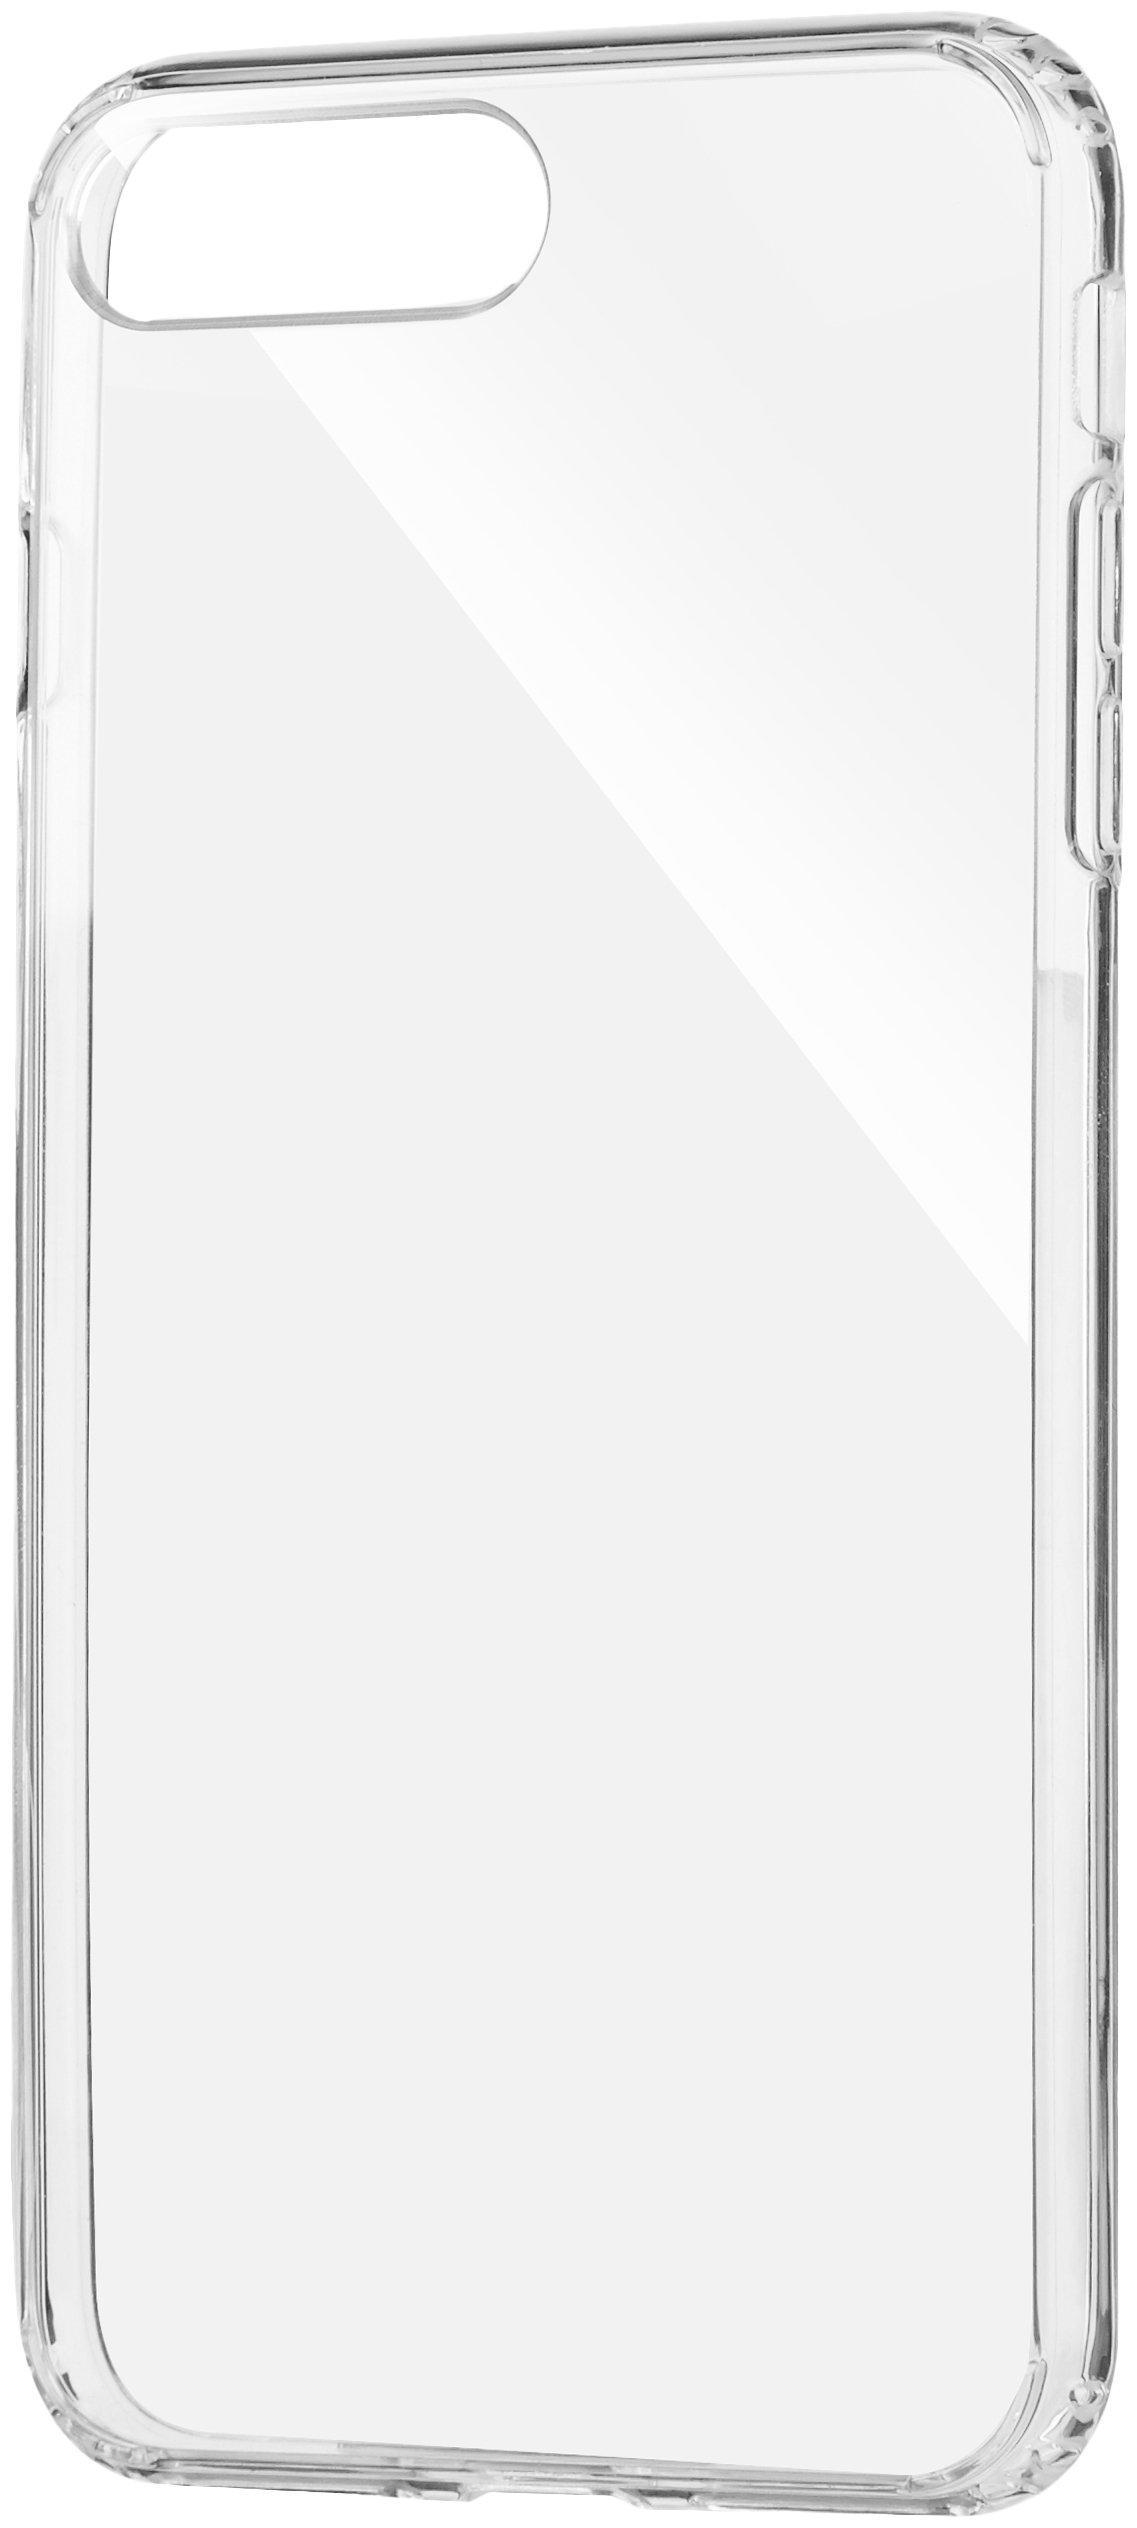 3c73f6672f7 Amazon.com  AmazonBasics iPhone 8 Plus   7 Plus Clear Case  Cell ...